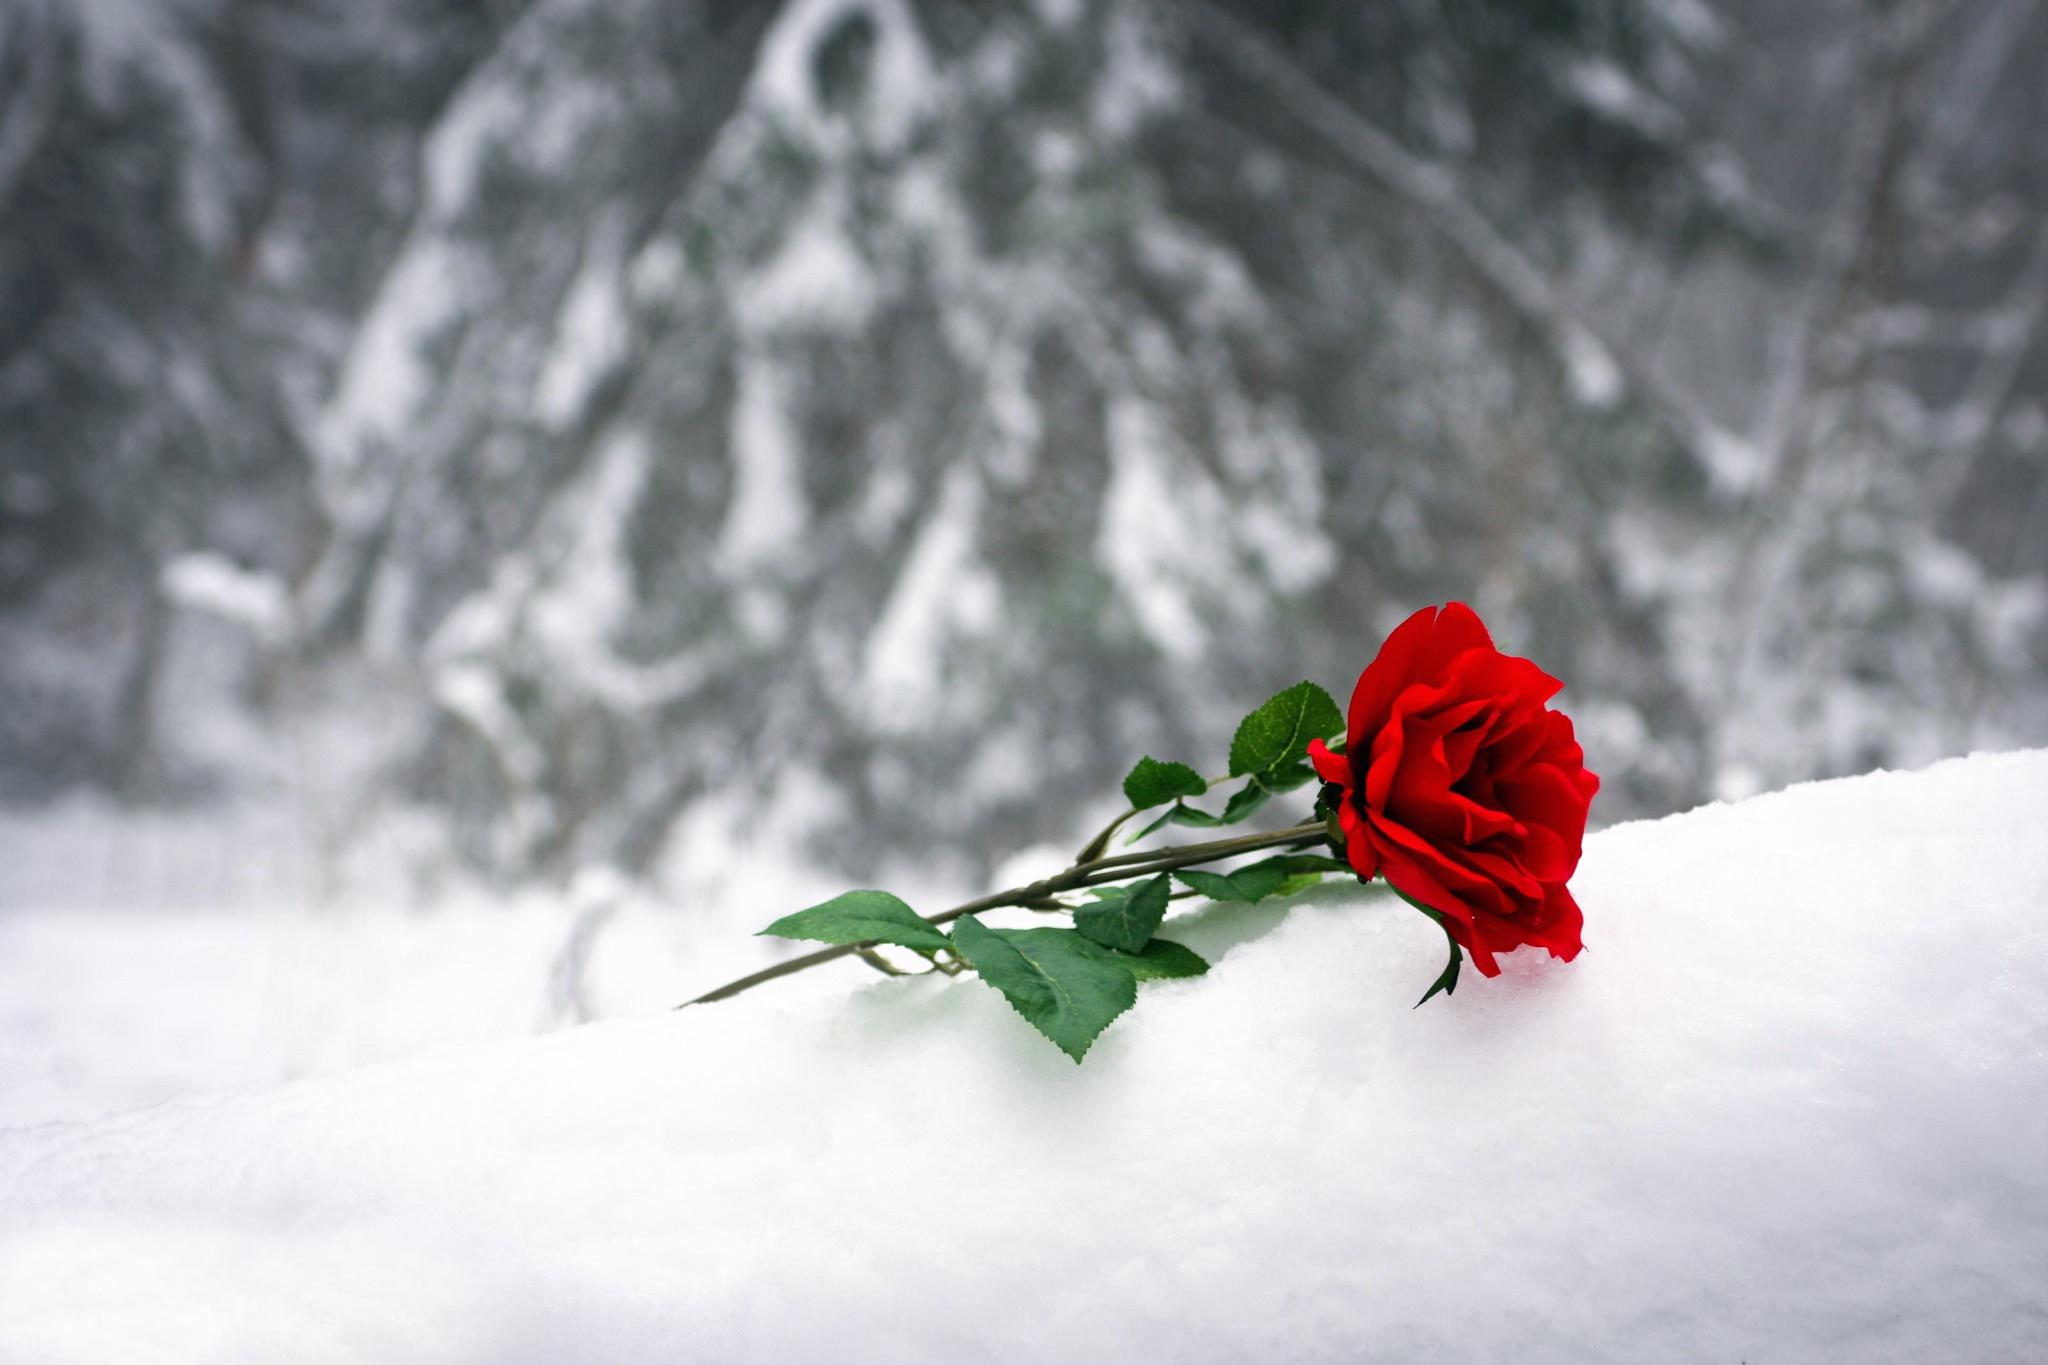 Картинки снег розы, картинки кератинового